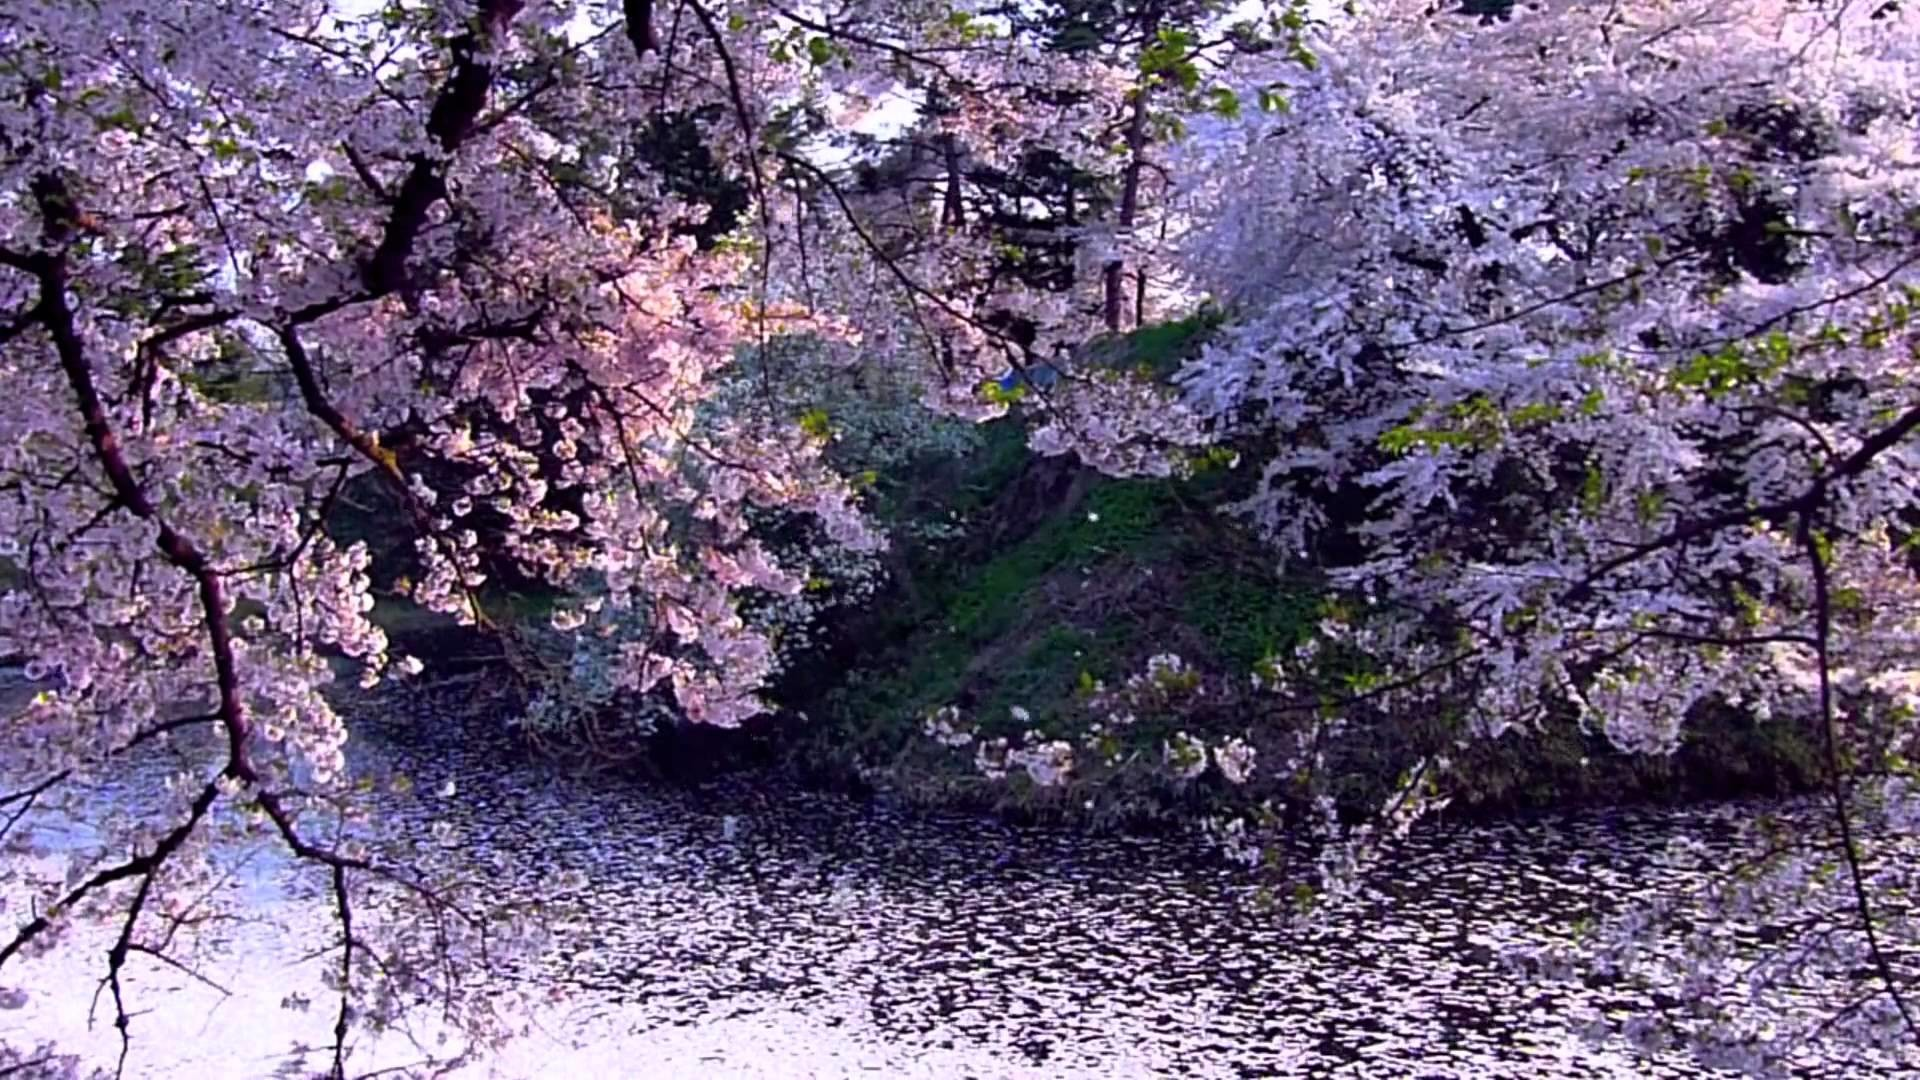 Falling Cherry Blossom Wallpaper Hd Cherry Blossom Hd Wallpaper 71 Images